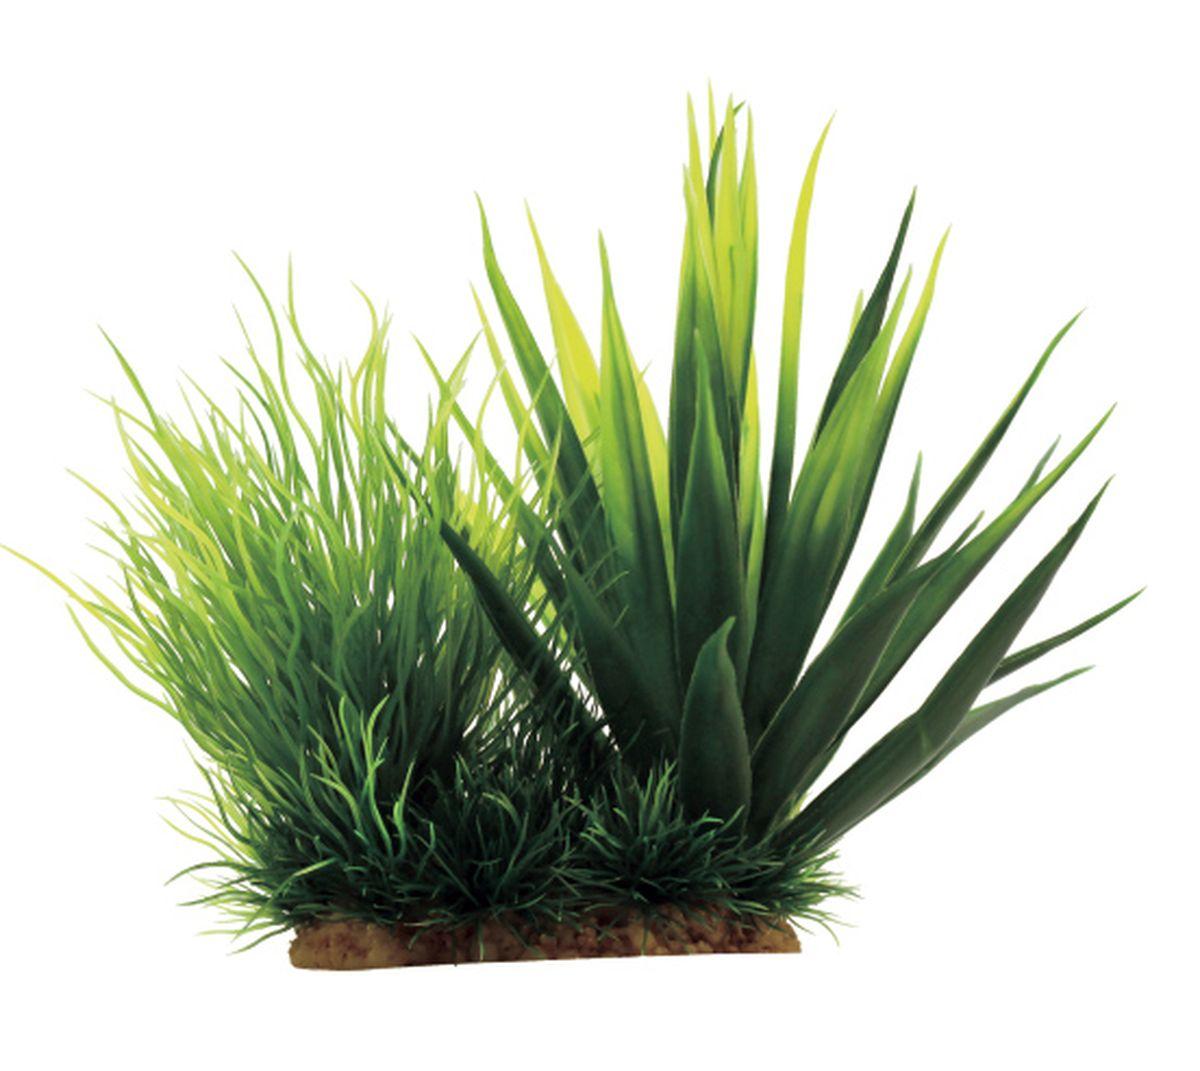 Растение для аквариума ArtUniq Агава, 18 x 12 x 16 смART-1130603Растение для аквариума ArtUniq Агава, 18 x 12 x 16 см